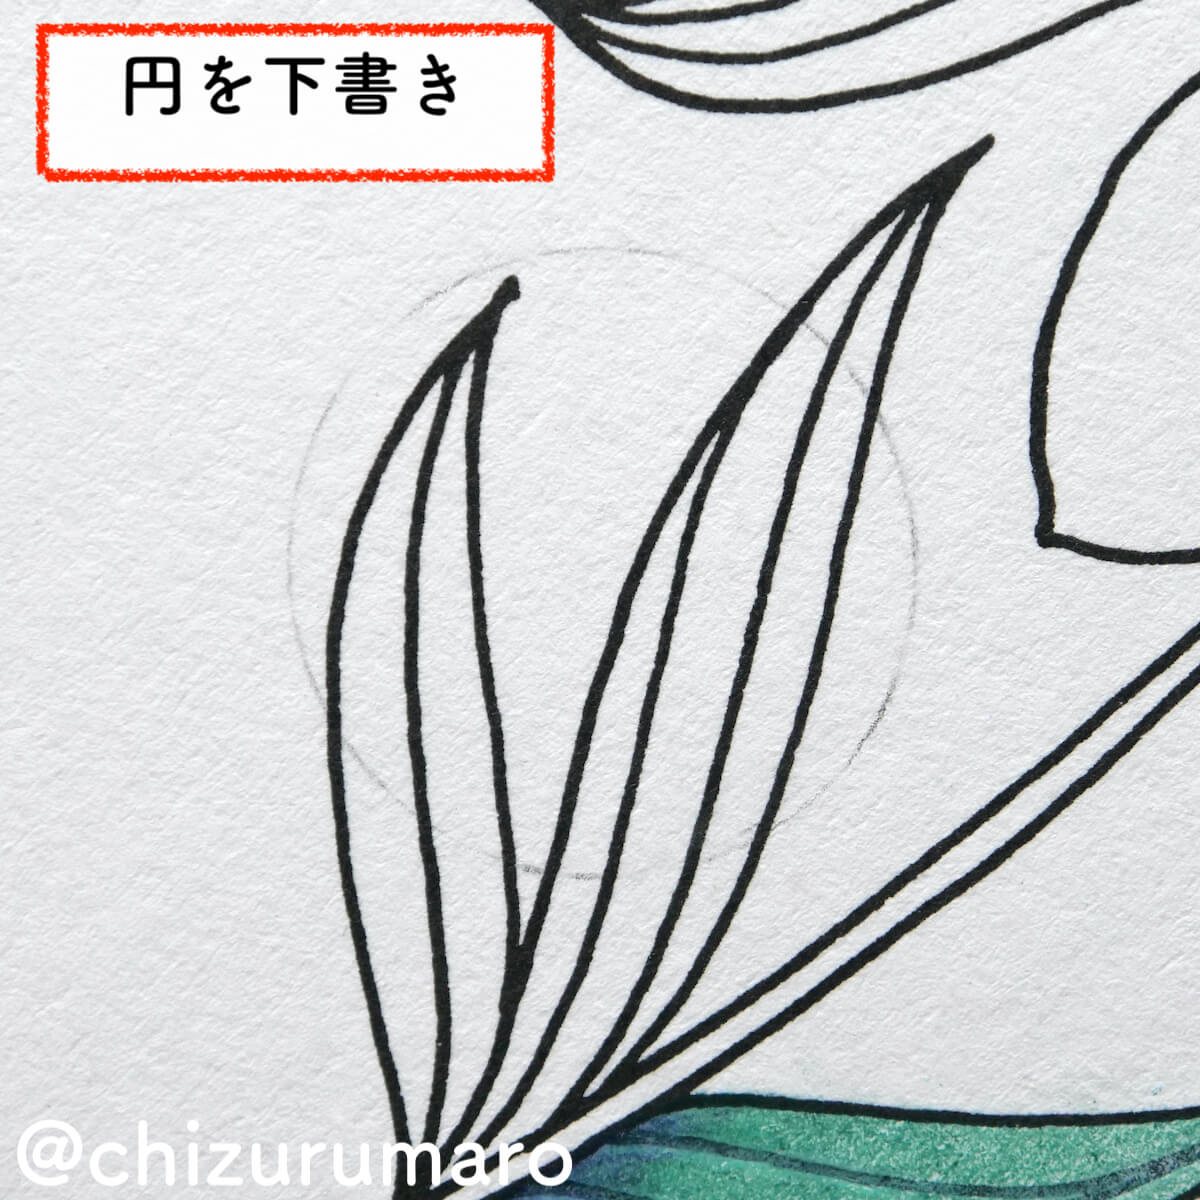 f:id:chizurumaro:20210819125503j:plain